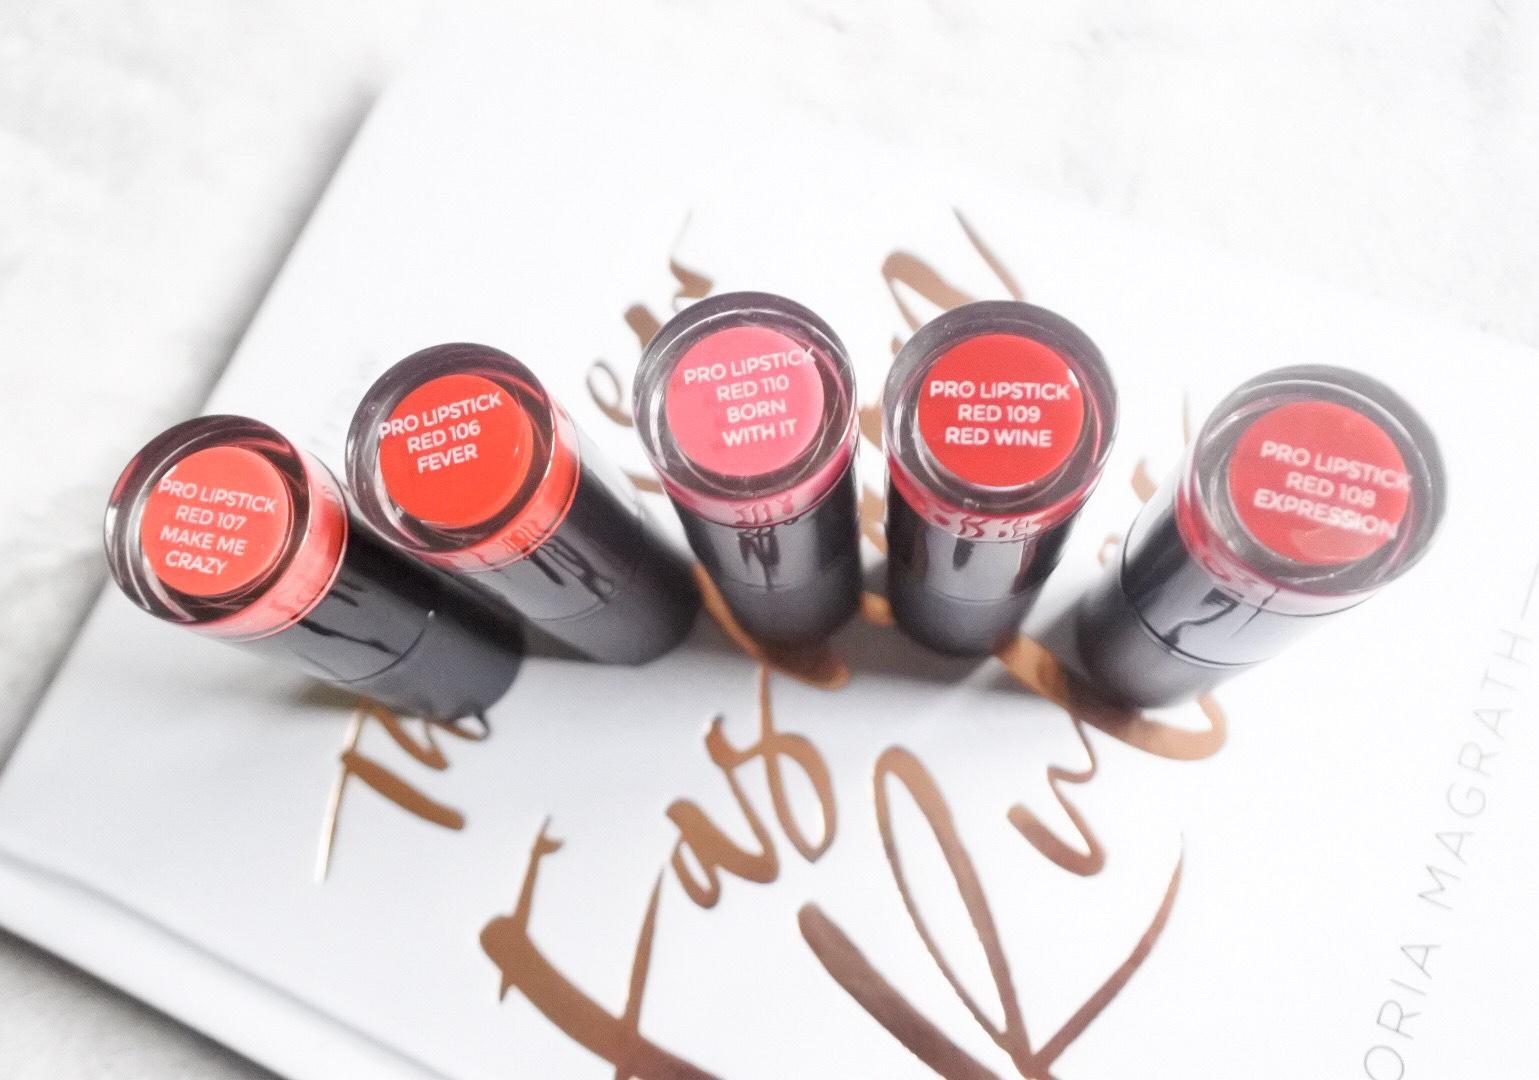 Revolution Pro Lipstick Review